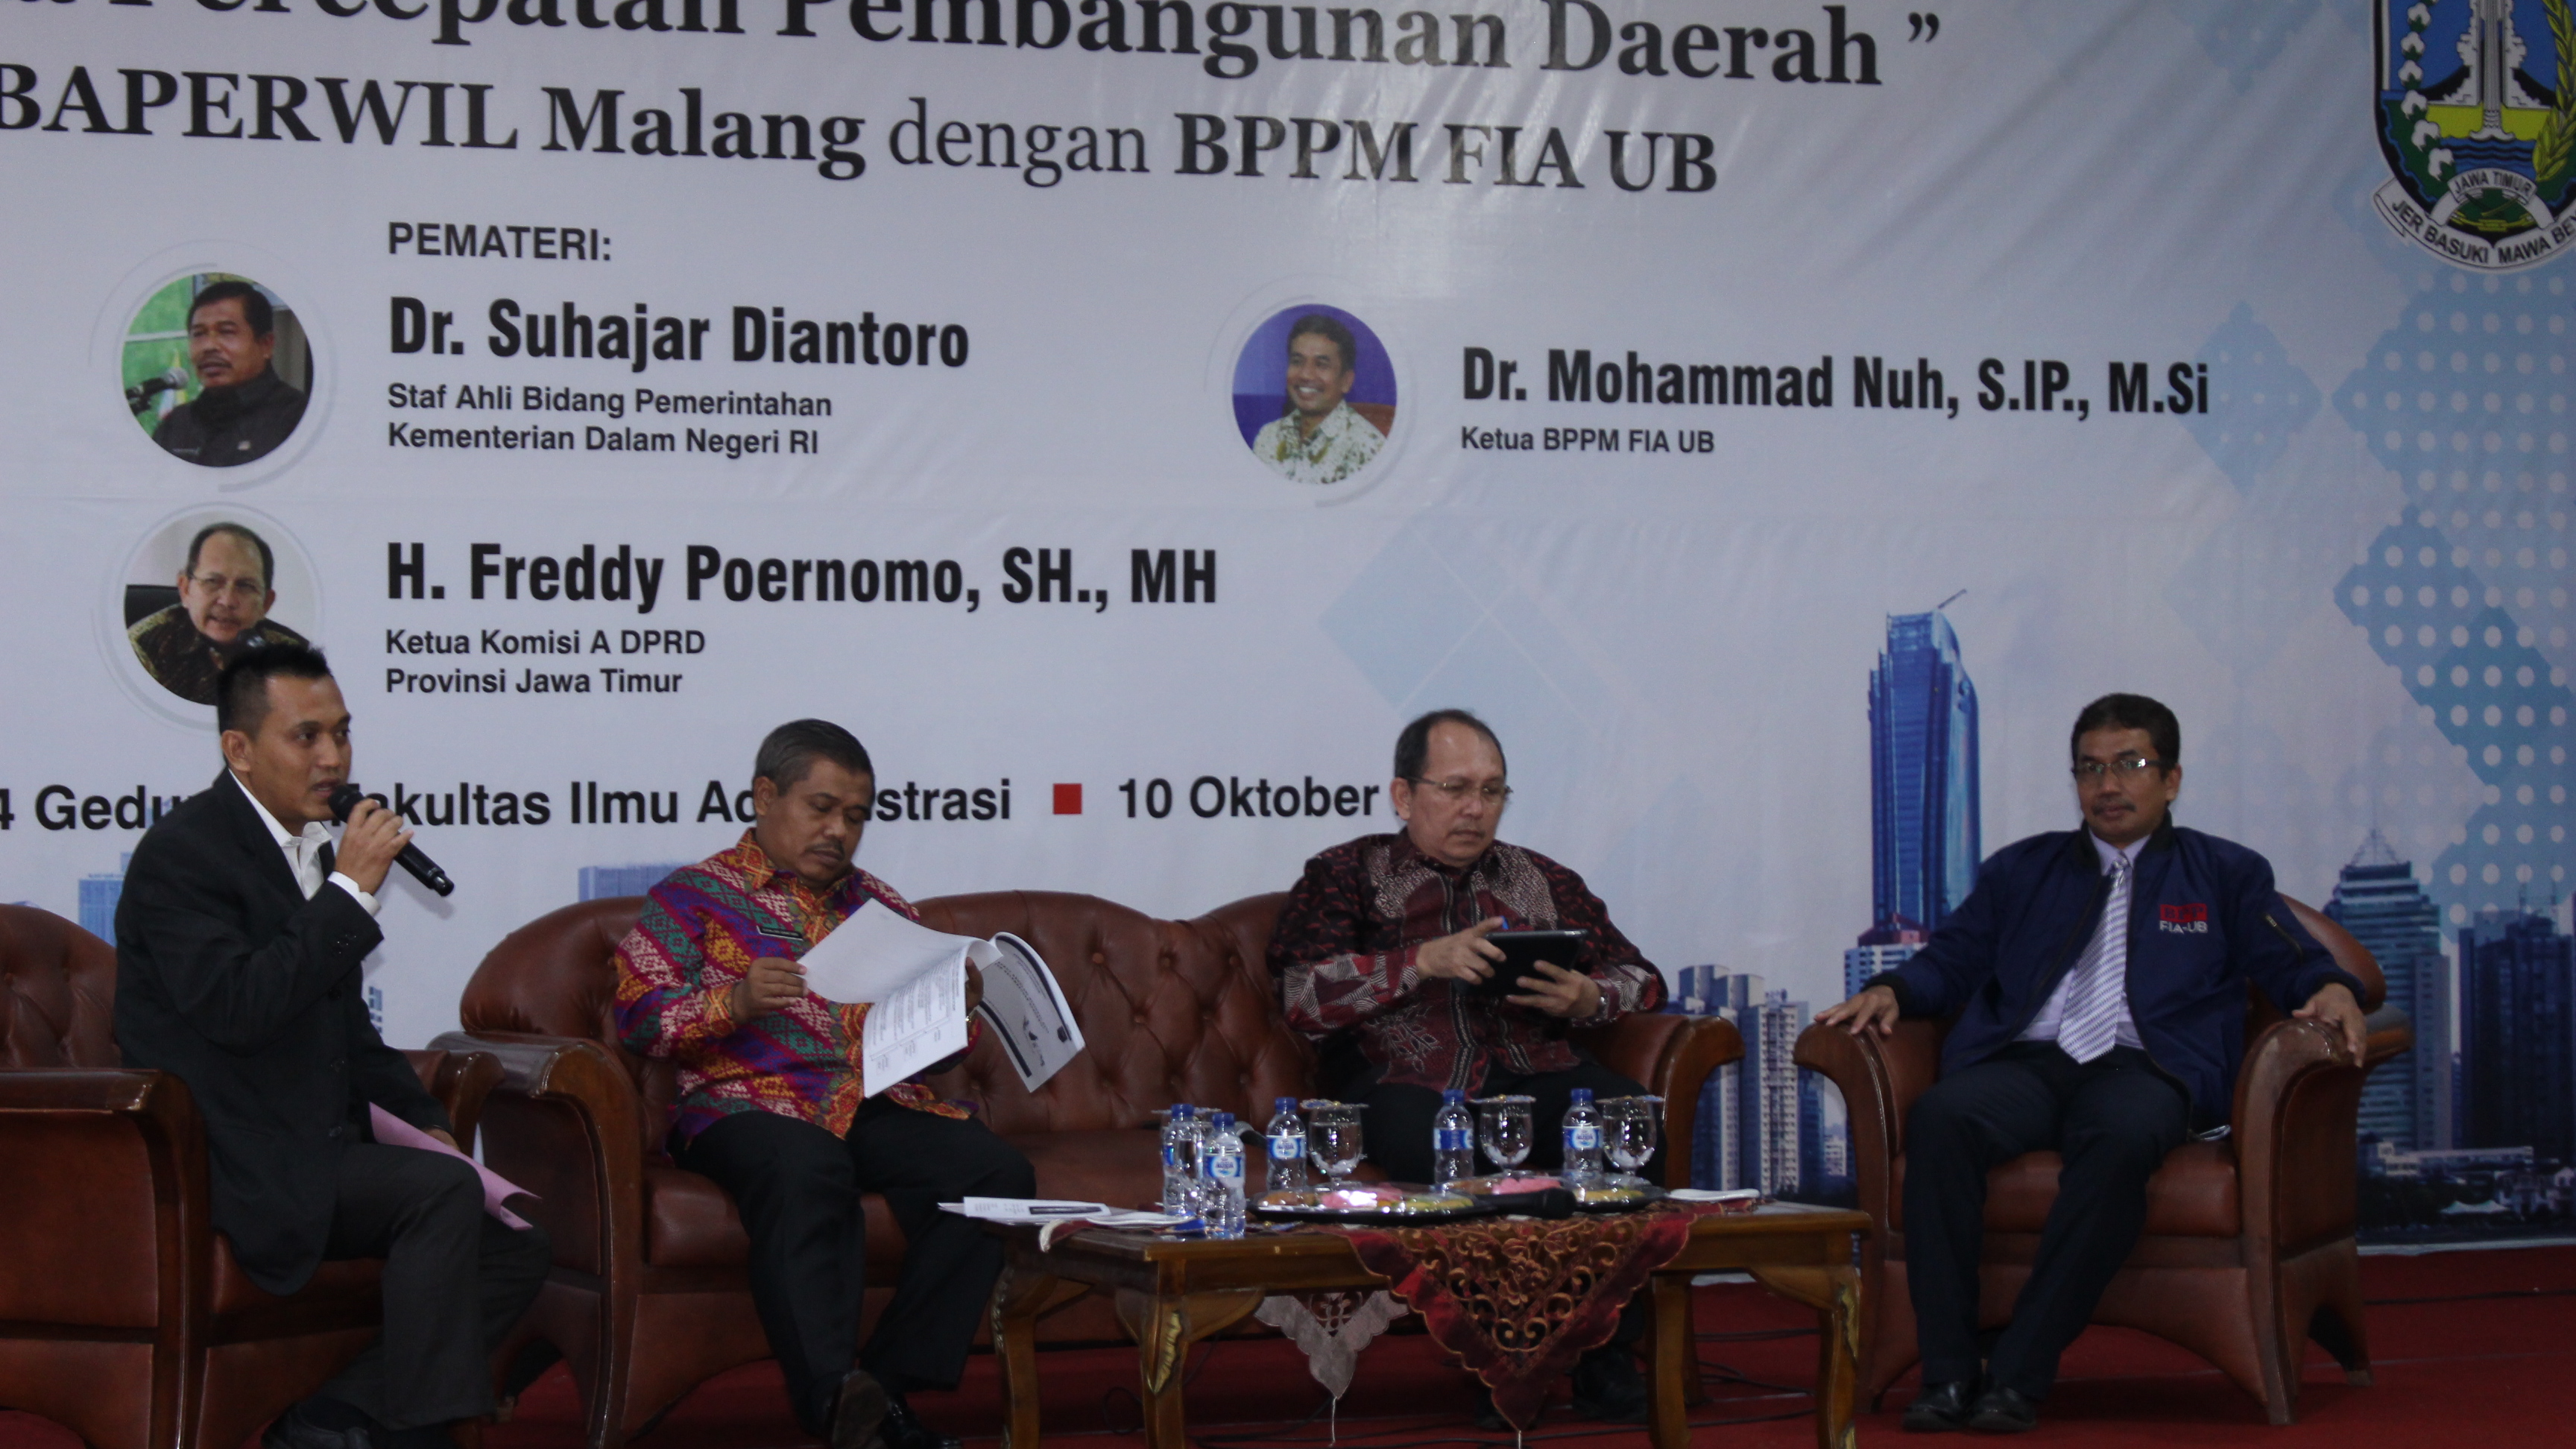 (English) Gandeng BPPM FIA UB, Badan Perwakilan Wilayah Malang Gelar Workshop Reformasi Peran Dan Fungsi Badan Koordinasi Wilayah